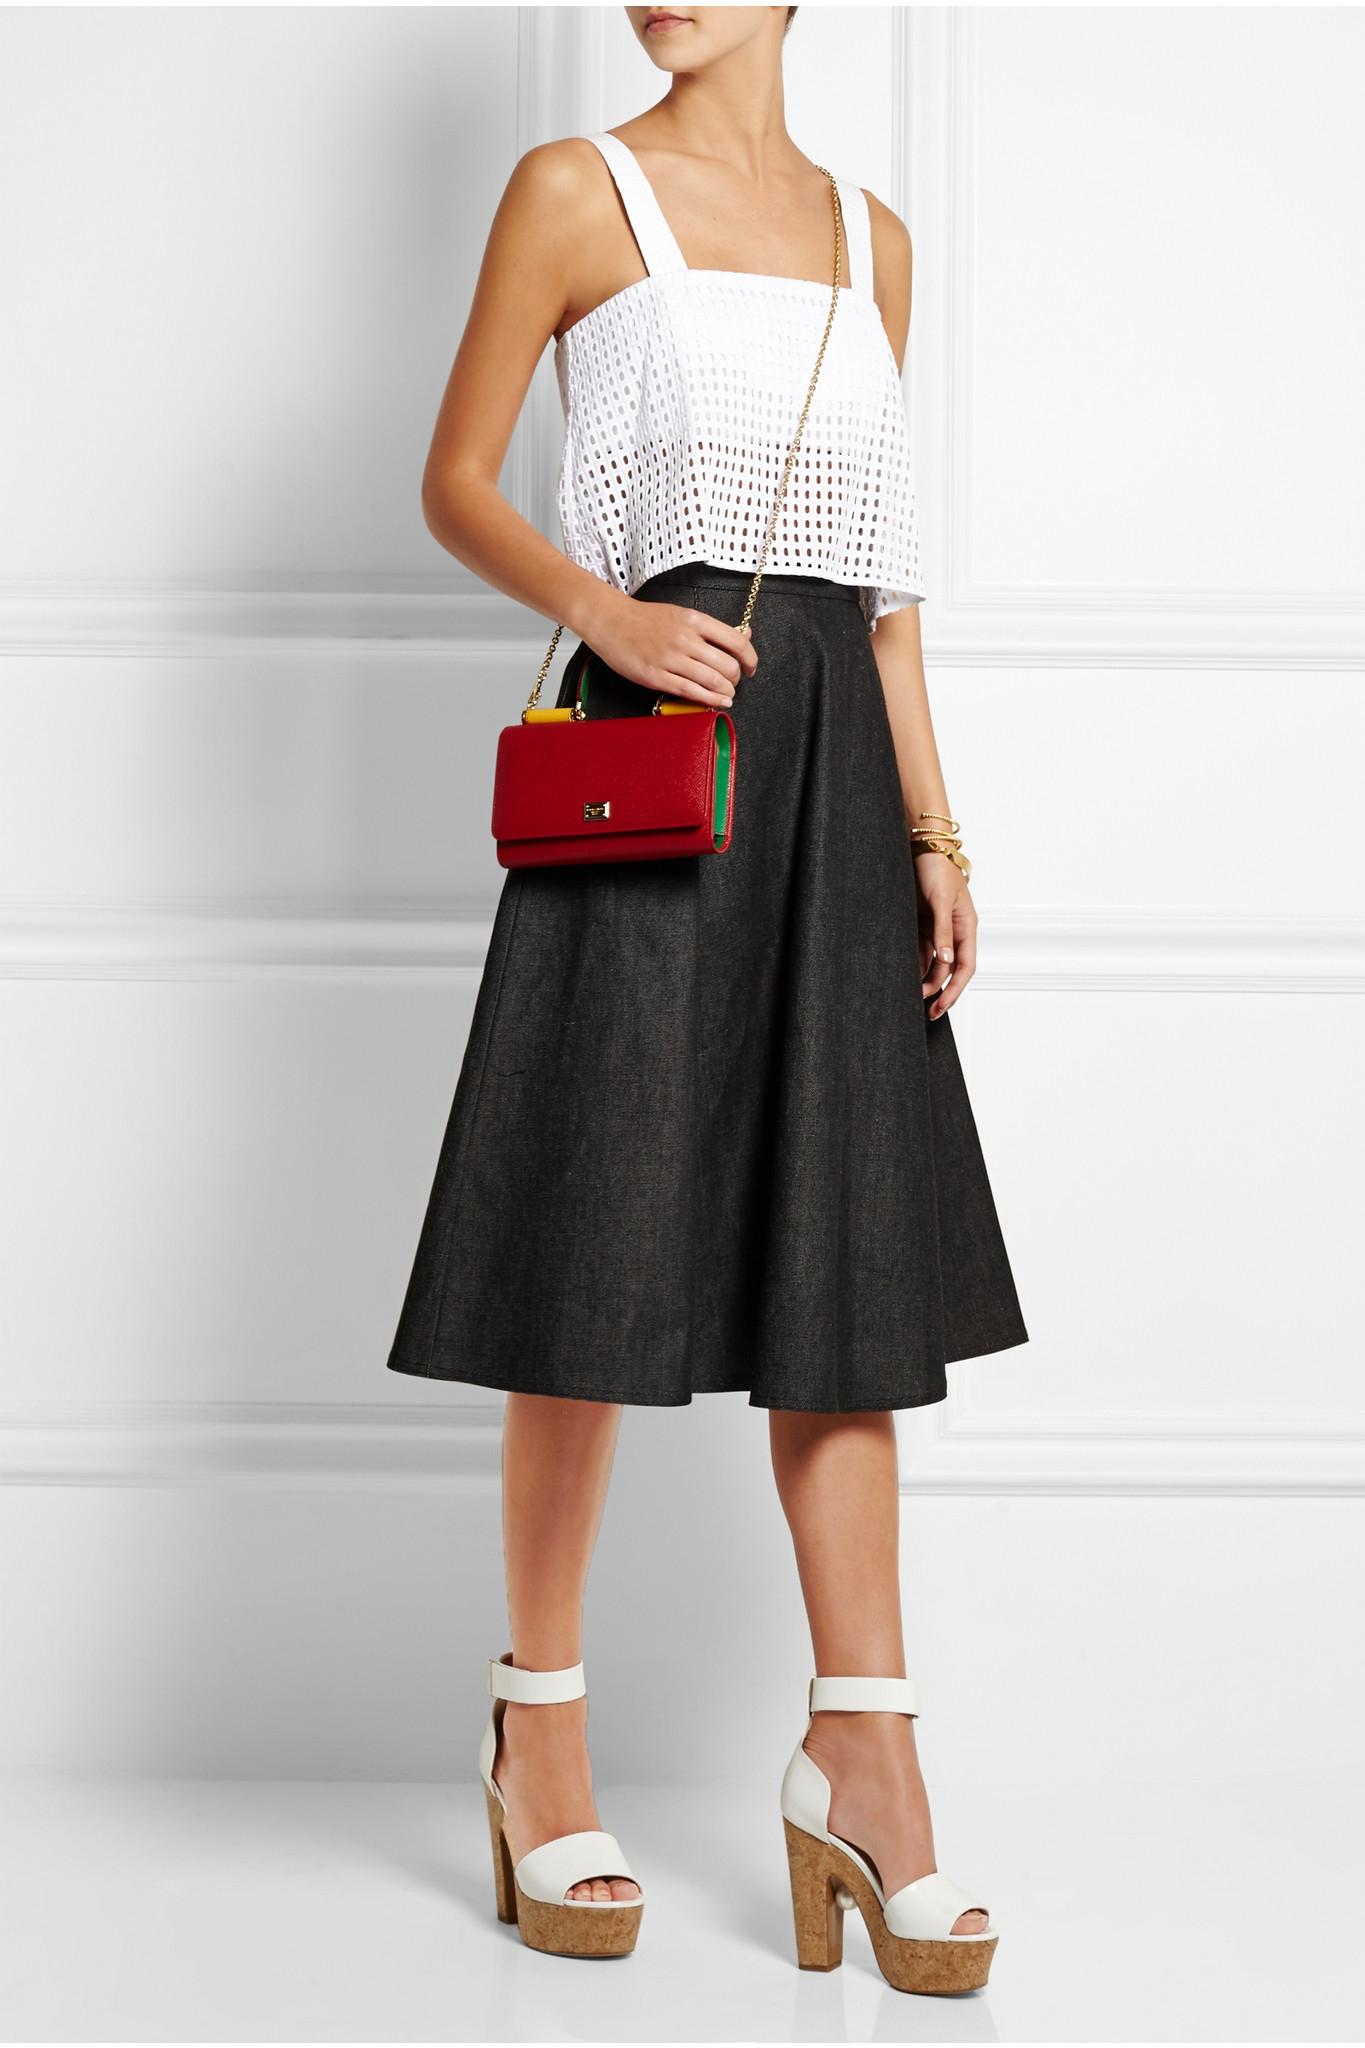 Dolce   Gabbana Lipstick Textured-leather Shoulder Bag in Red - Lyst 09fbb3d2d15d0